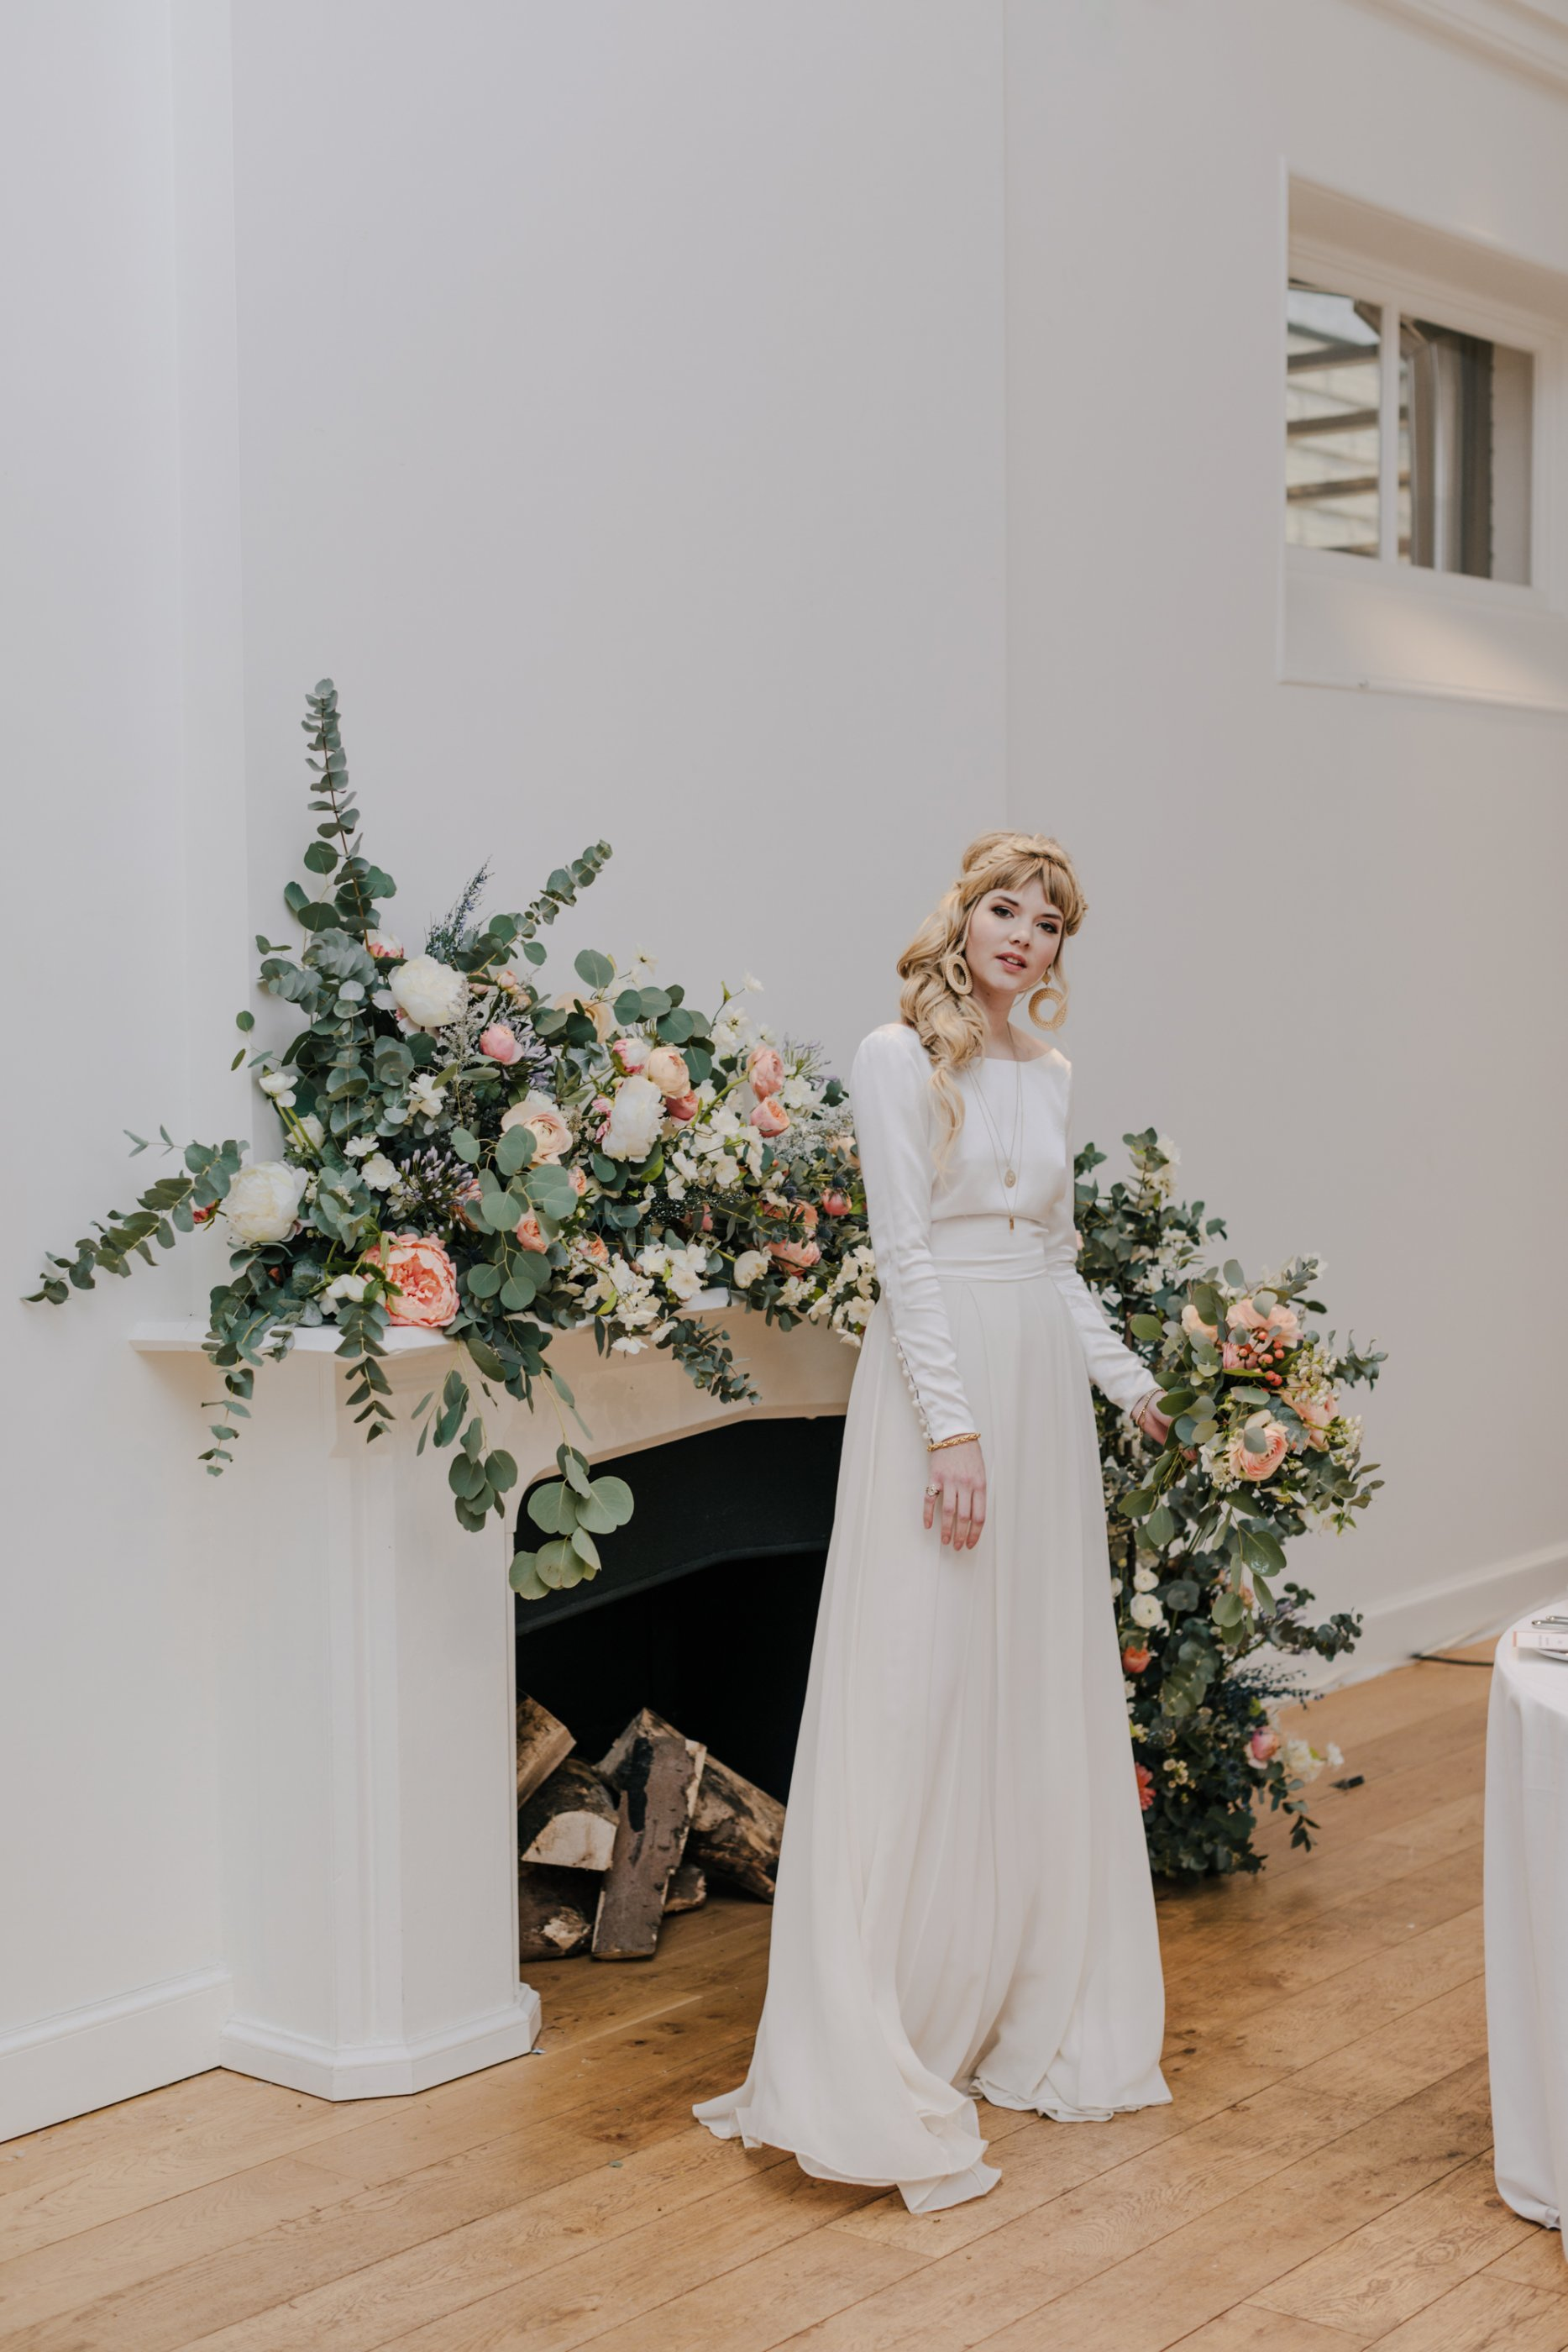 Belle Bunty Bridal Gowns Stylish Tablewear Gift Ideas From